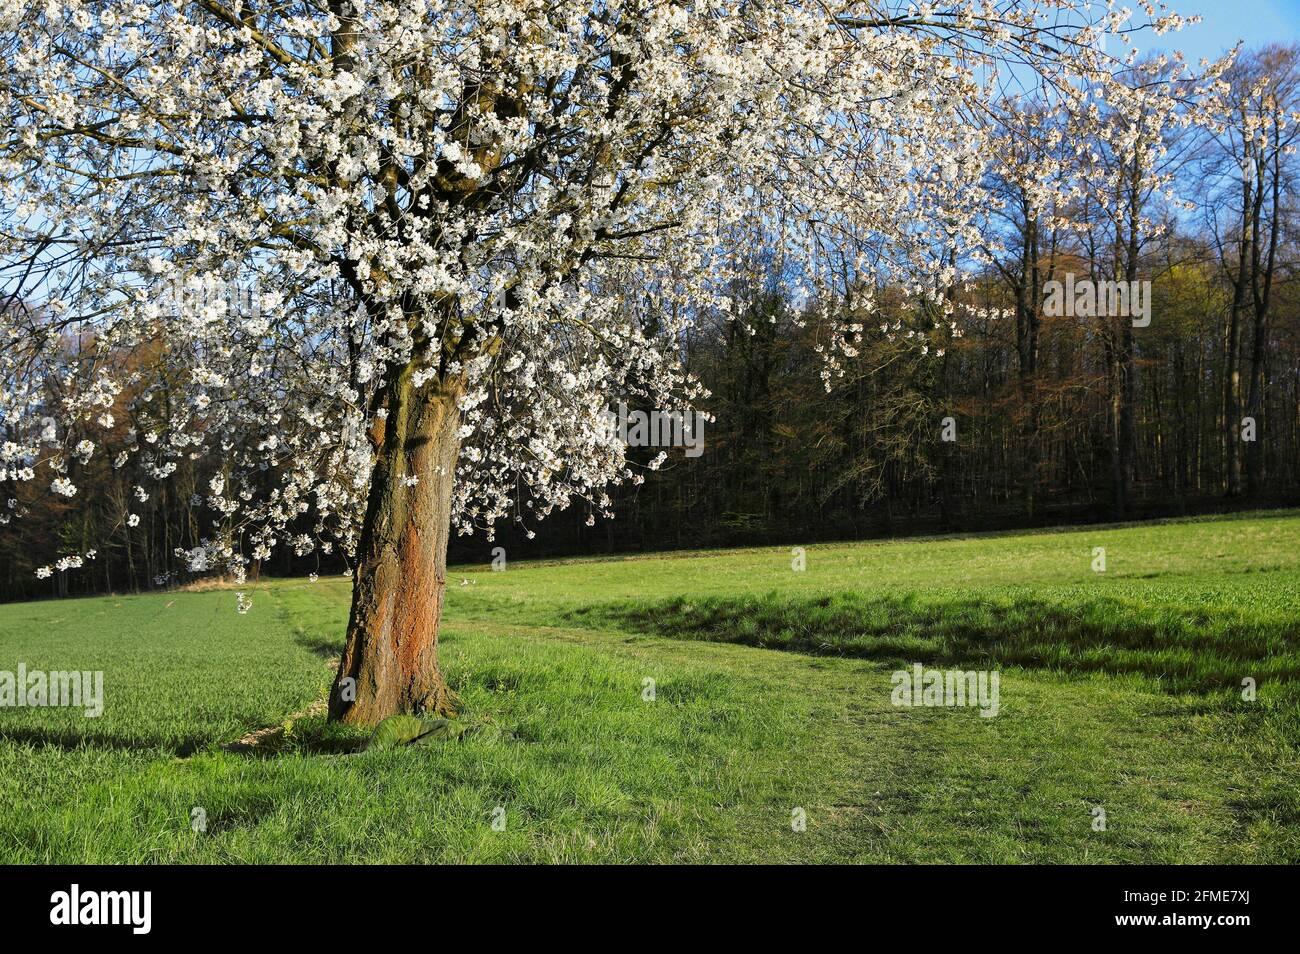 Nature Art: Cherry blossom photoshooting with model Lana as grass bodypainting at Groeninger Feld in Hameln, on may 5, 2021 - Bodypainting artist: Joerg Duesterwald Stock Photo